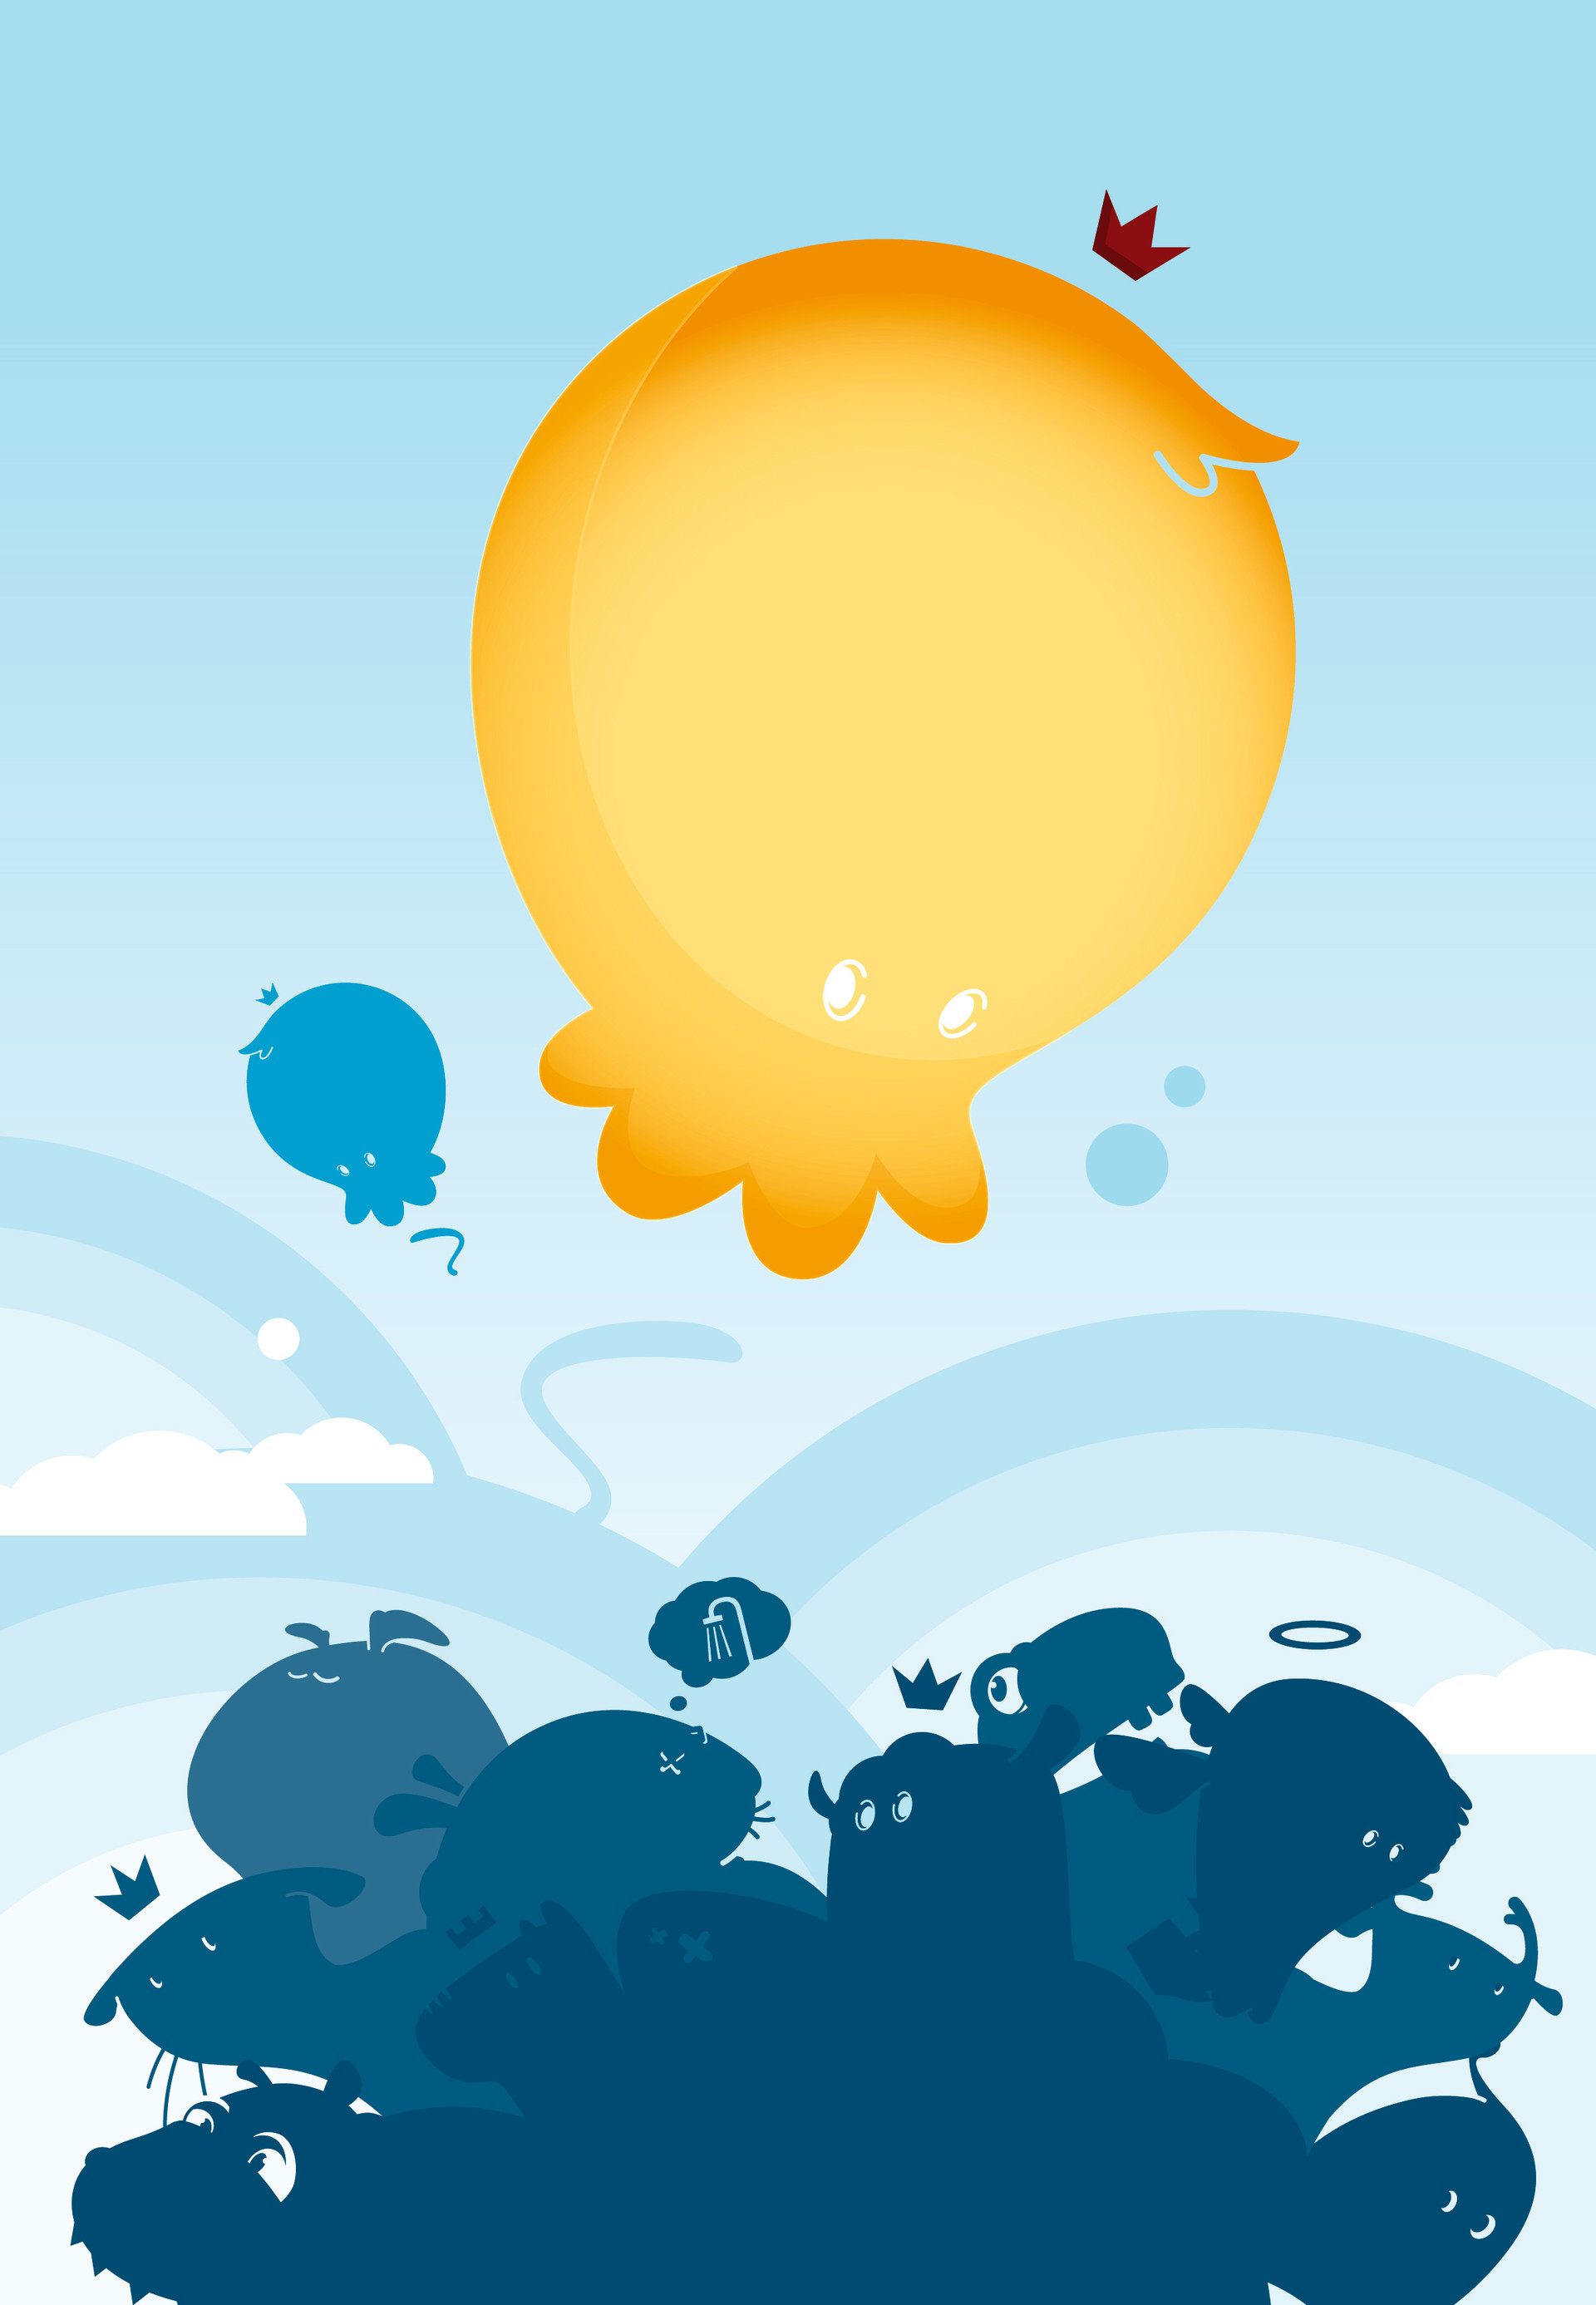 latex ballon.jpg